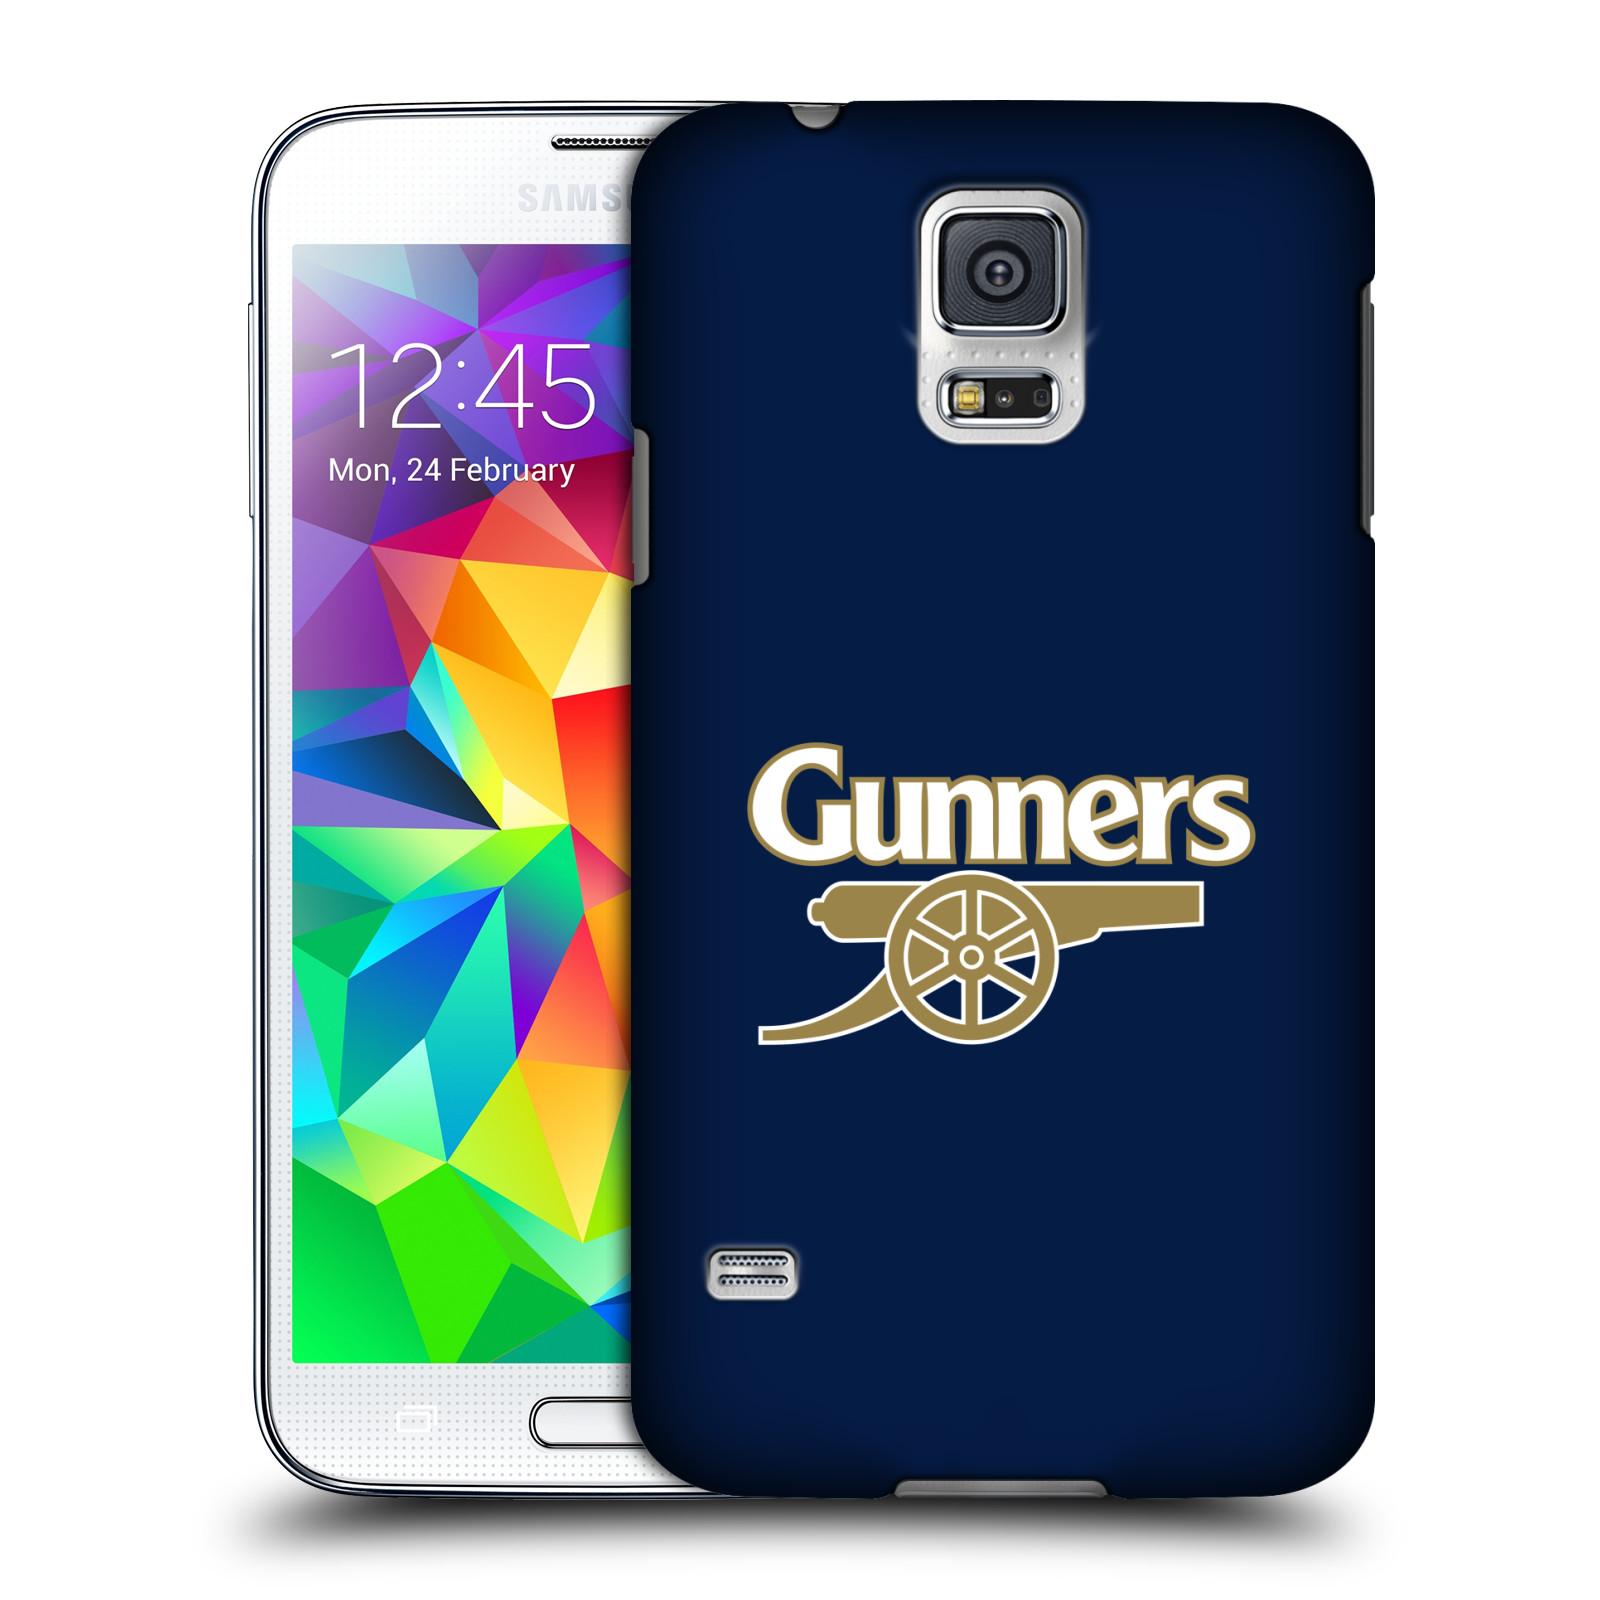 Plastové pouzdro na mobil Samsung Galaxy S5 - Head Case - Arsenal FC - Gunners